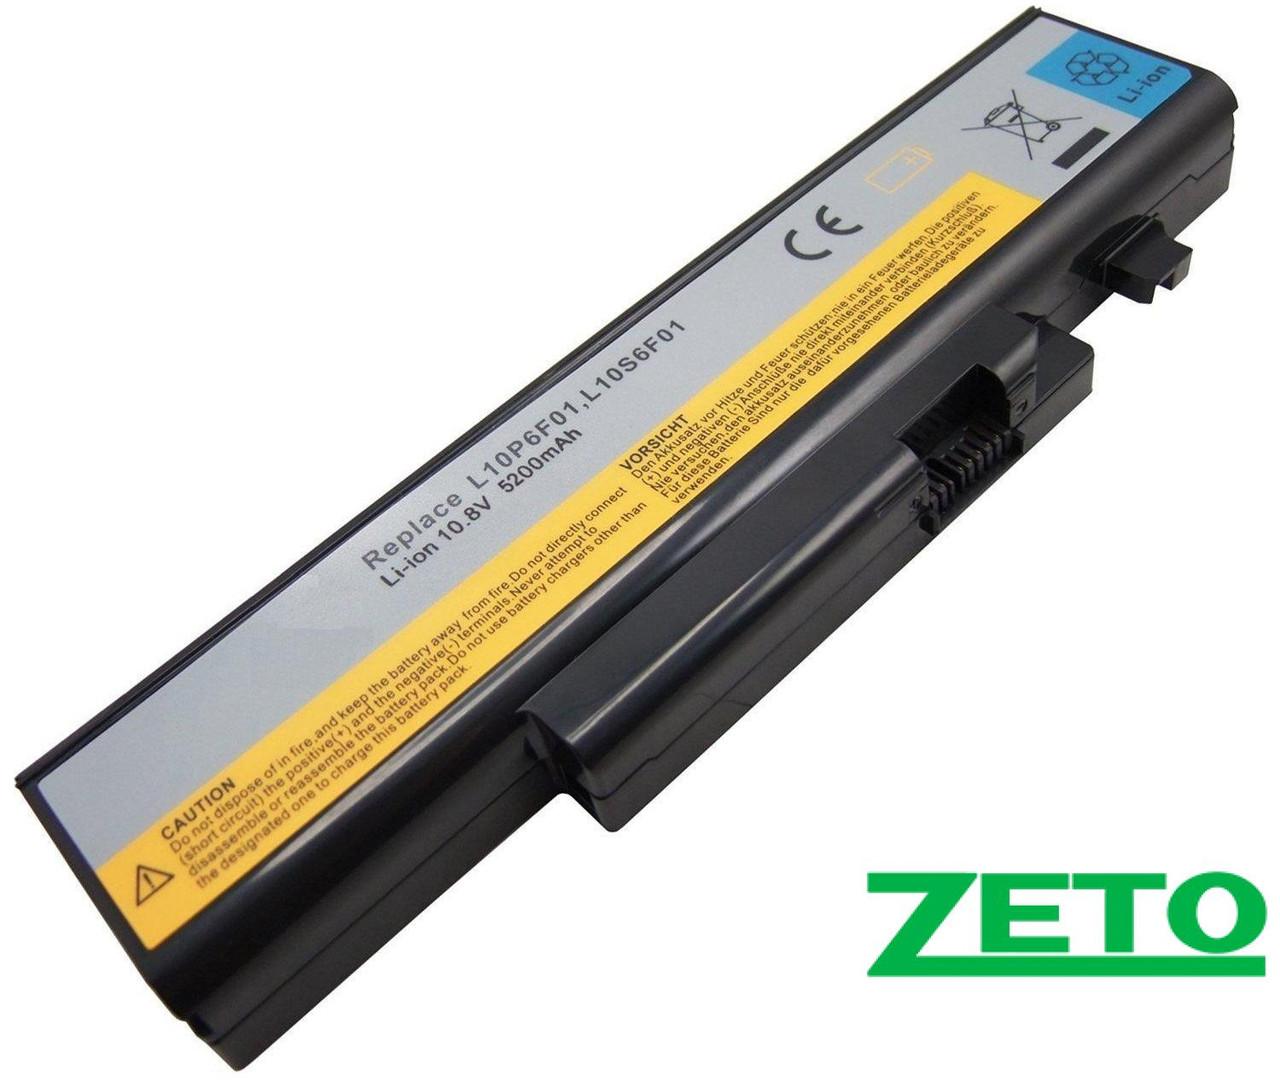 Батарея (аккумулятор) Lenovo IdeaPad Y470 (10.8V 5200mAh)